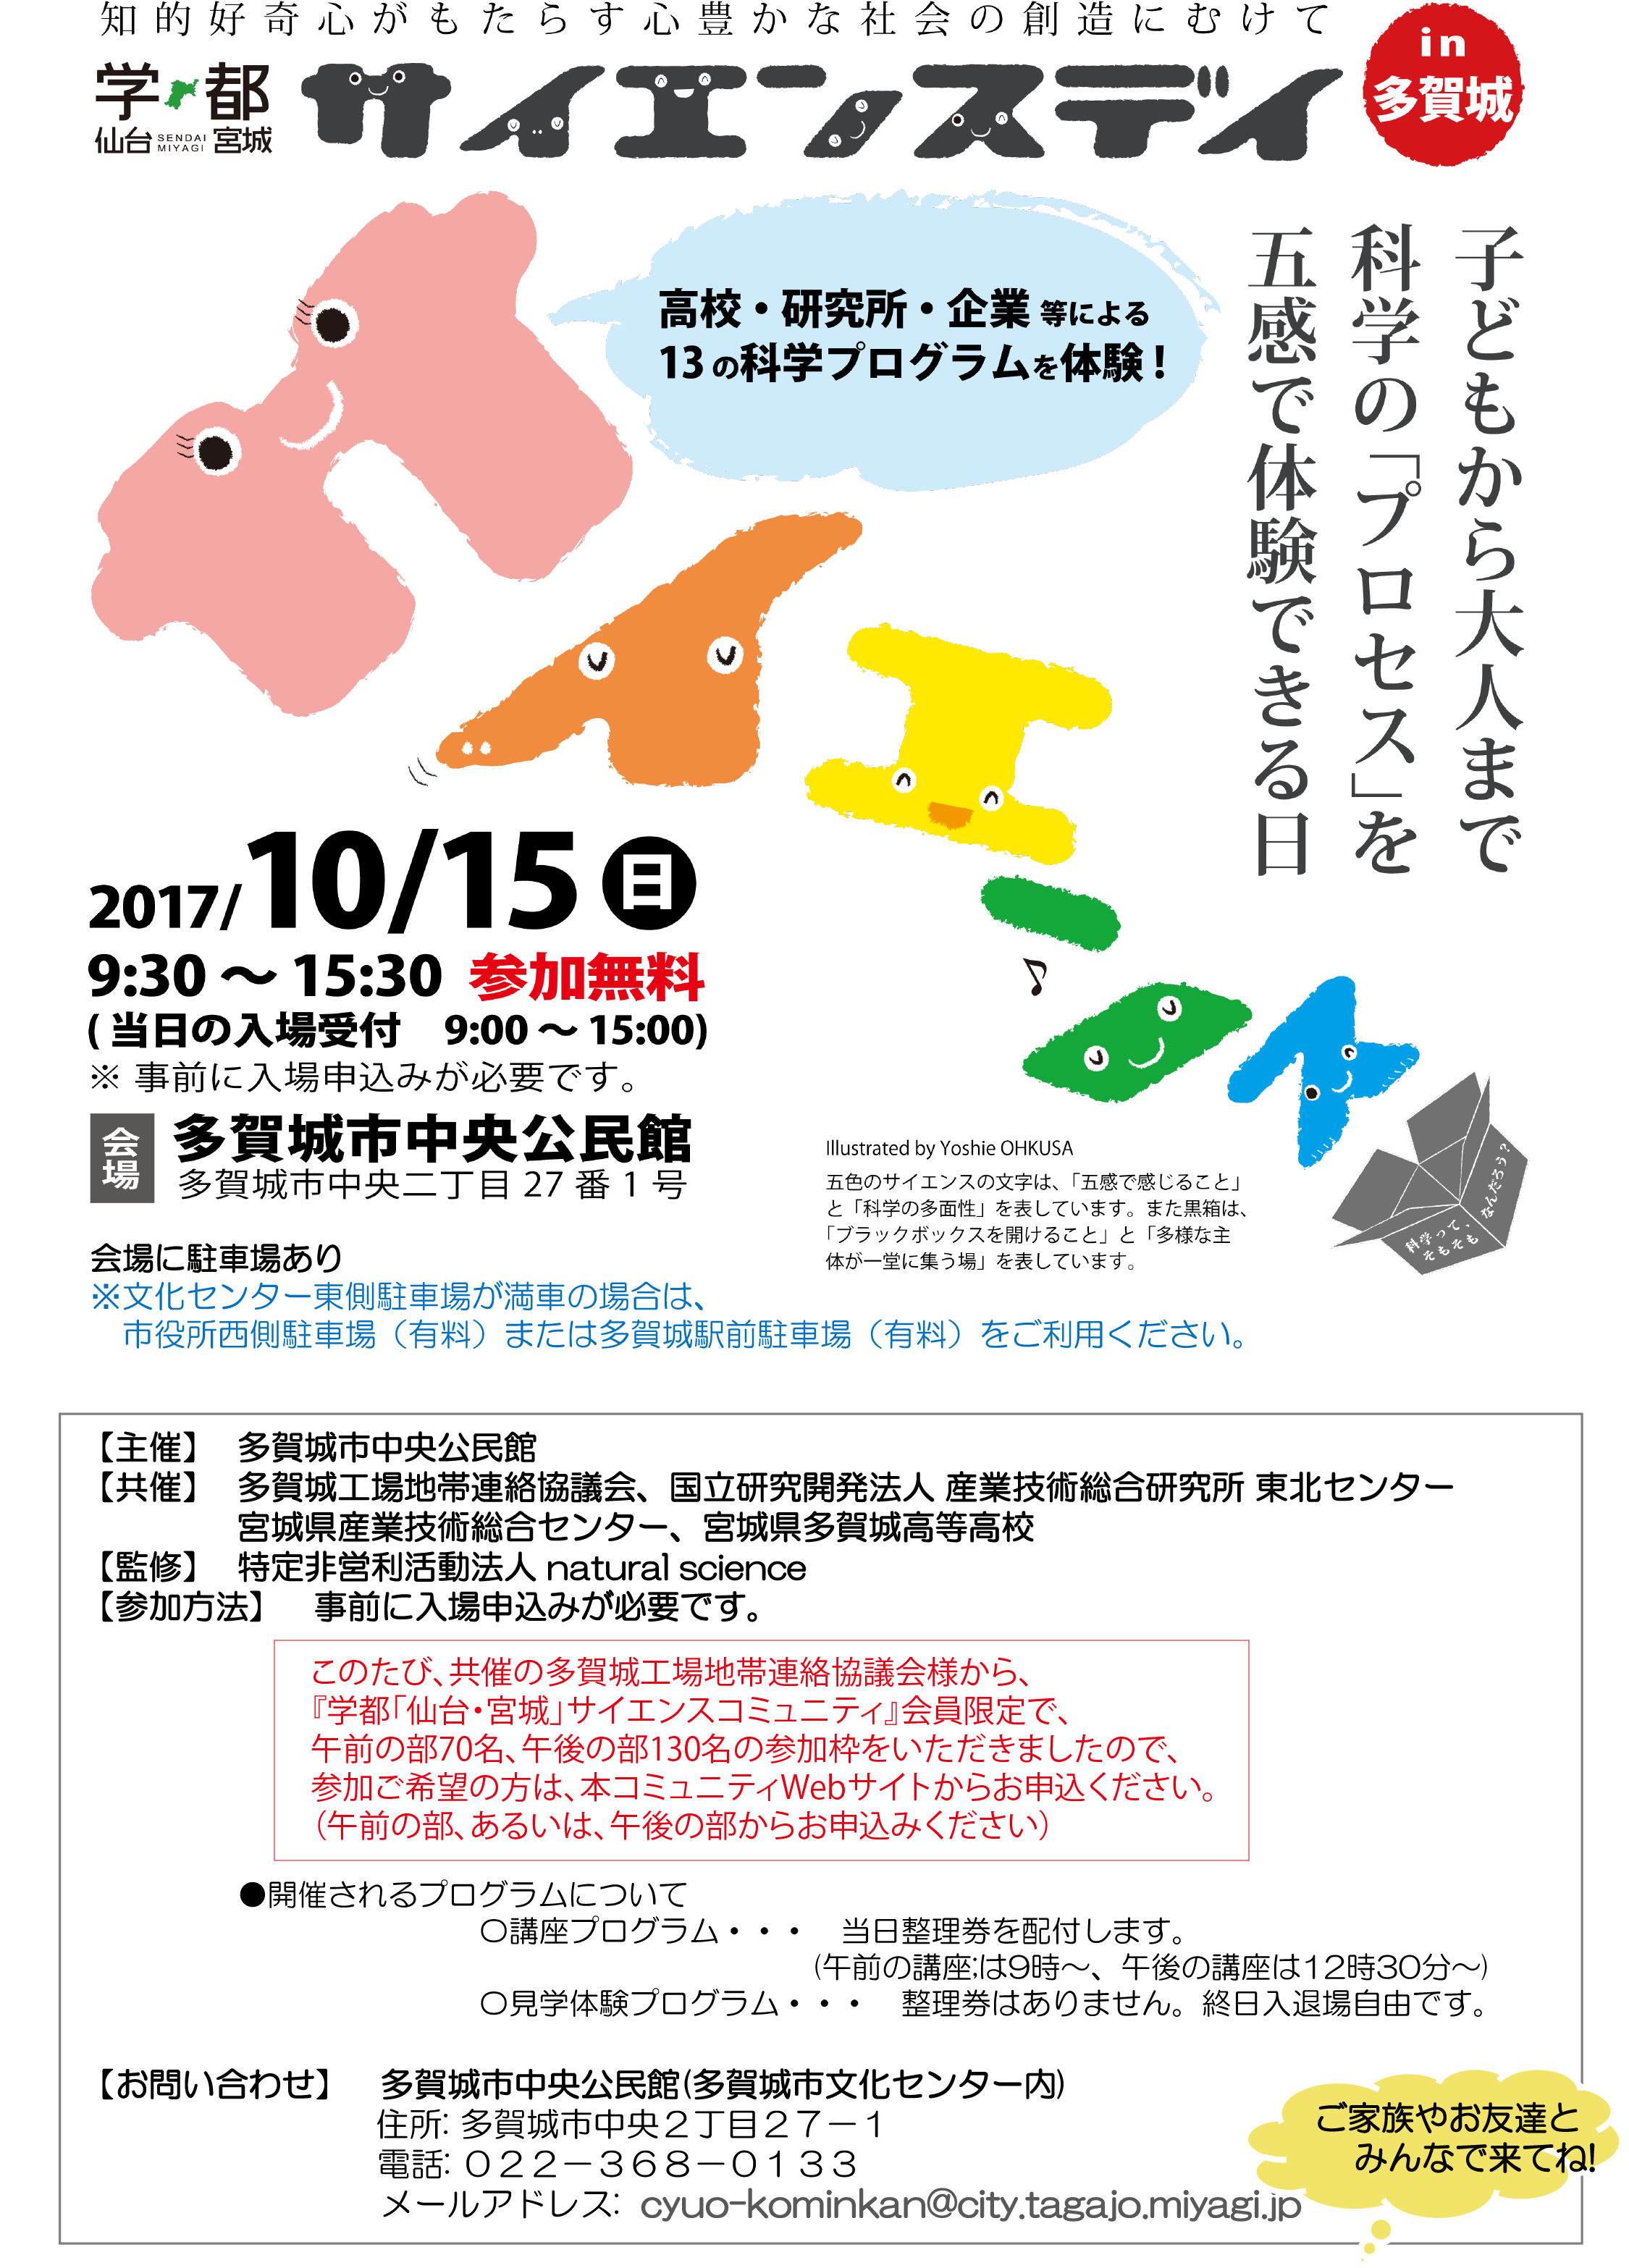 20170229-1